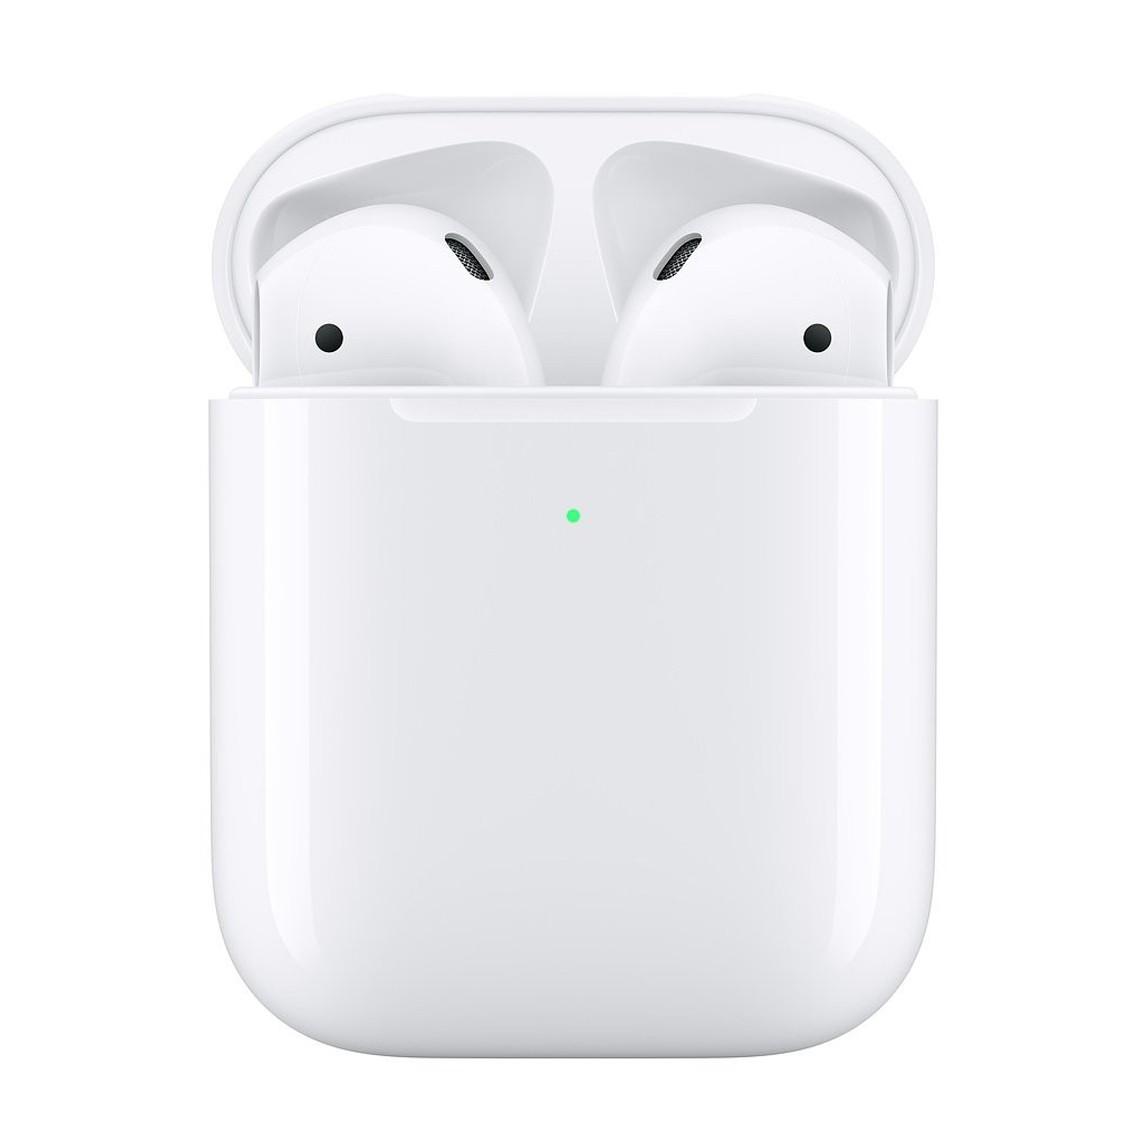 Casti i9000 TWS AIR 2 Techstar®, Bluetooth 5.0, Wireless QI, Pentru Android si iOS, Alb, Rezistente la Apa